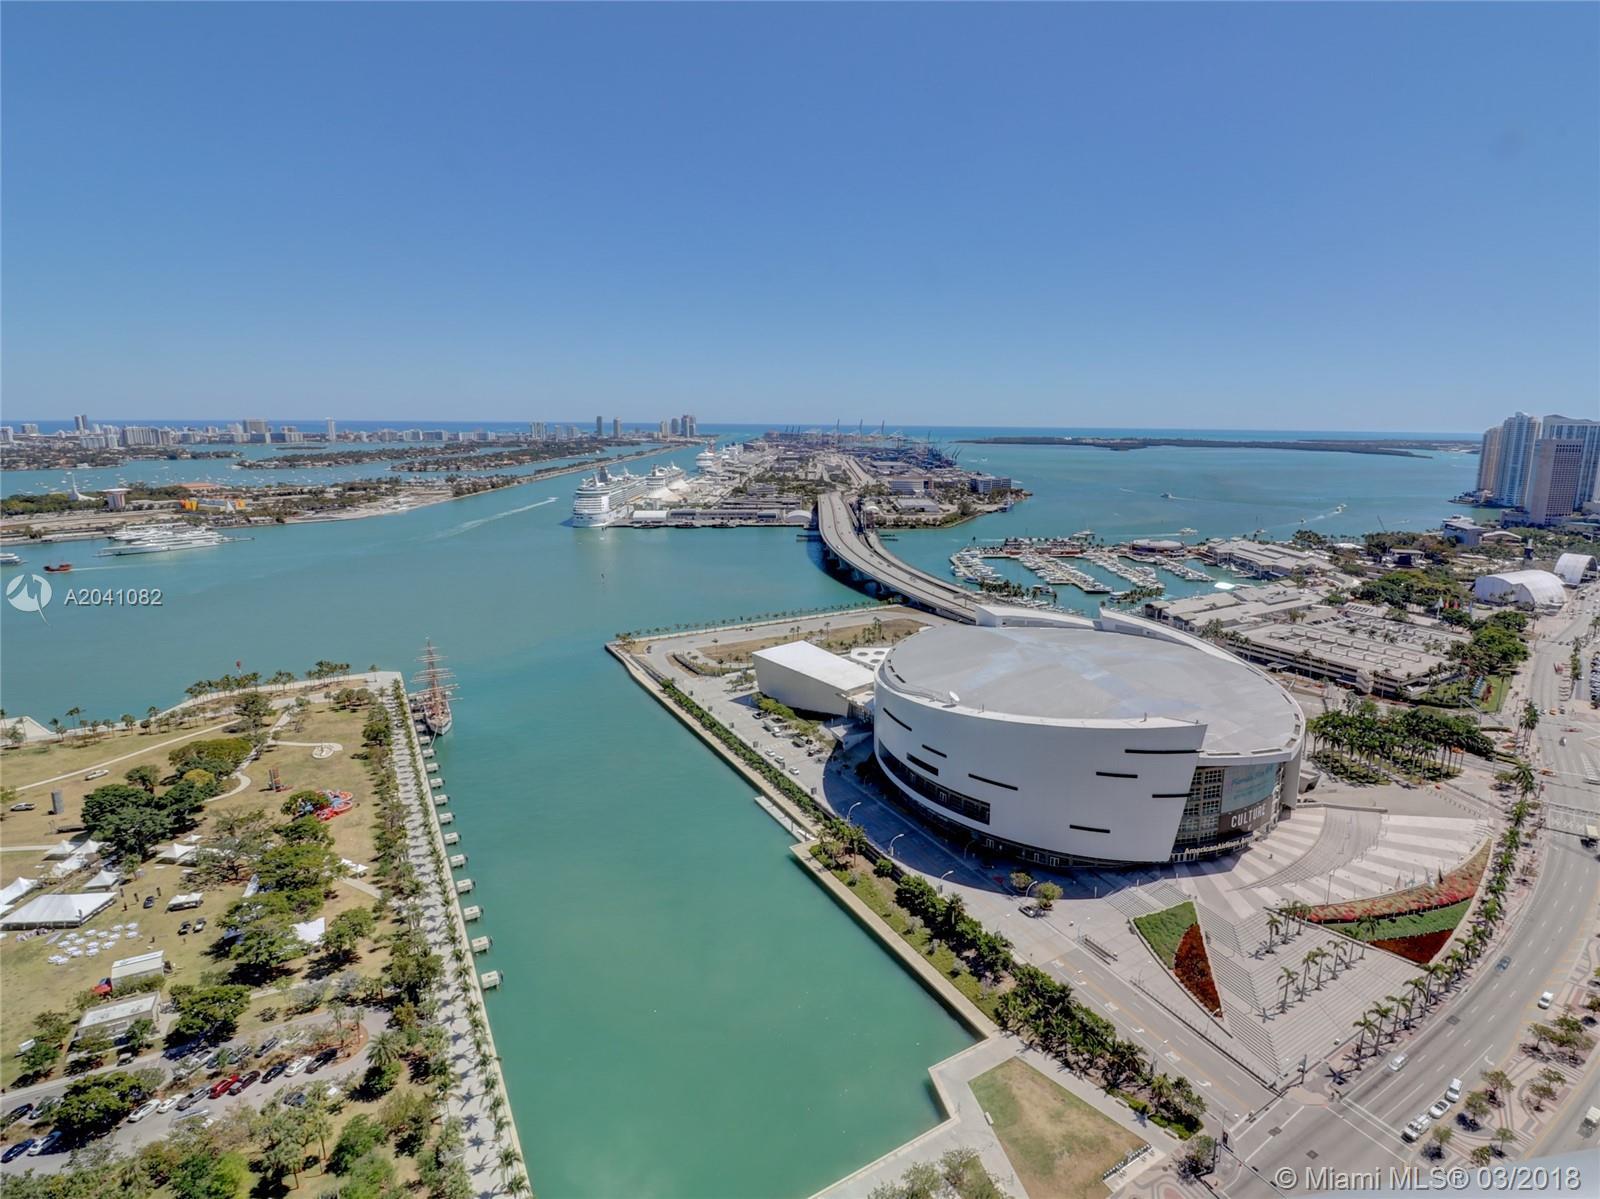 900 Biscayne Bay #4201 - 900 BISCAYNE BL #4201, Miami, FL 33132